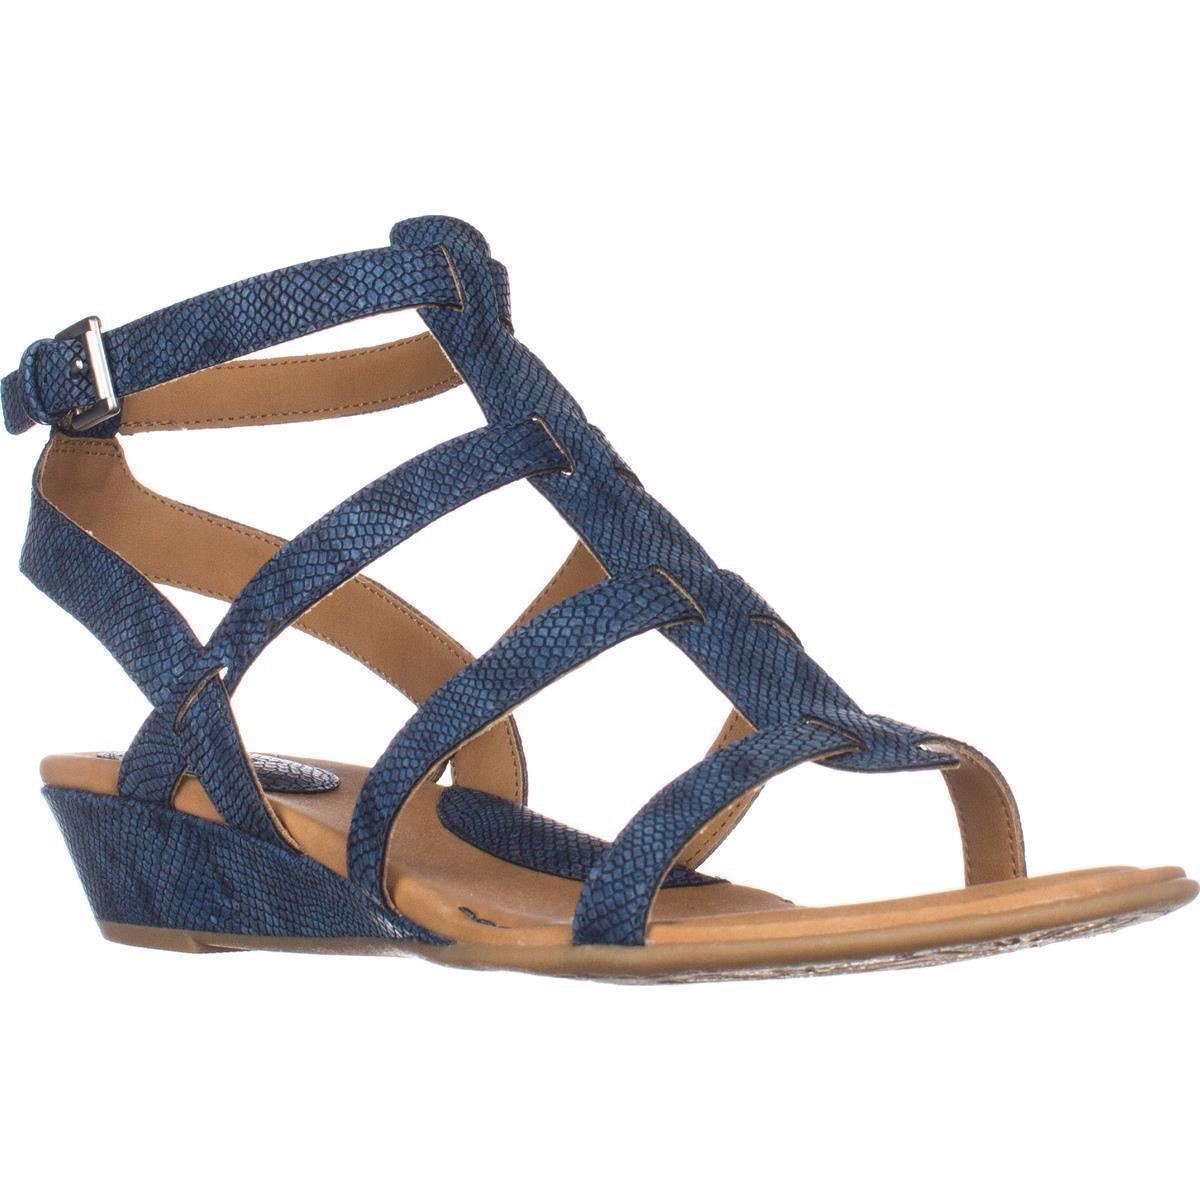 ed62a9435619 Born womens heidi open toe casual platform sandals navy size platforms  wedges jpg 1200x1200 Born sandels